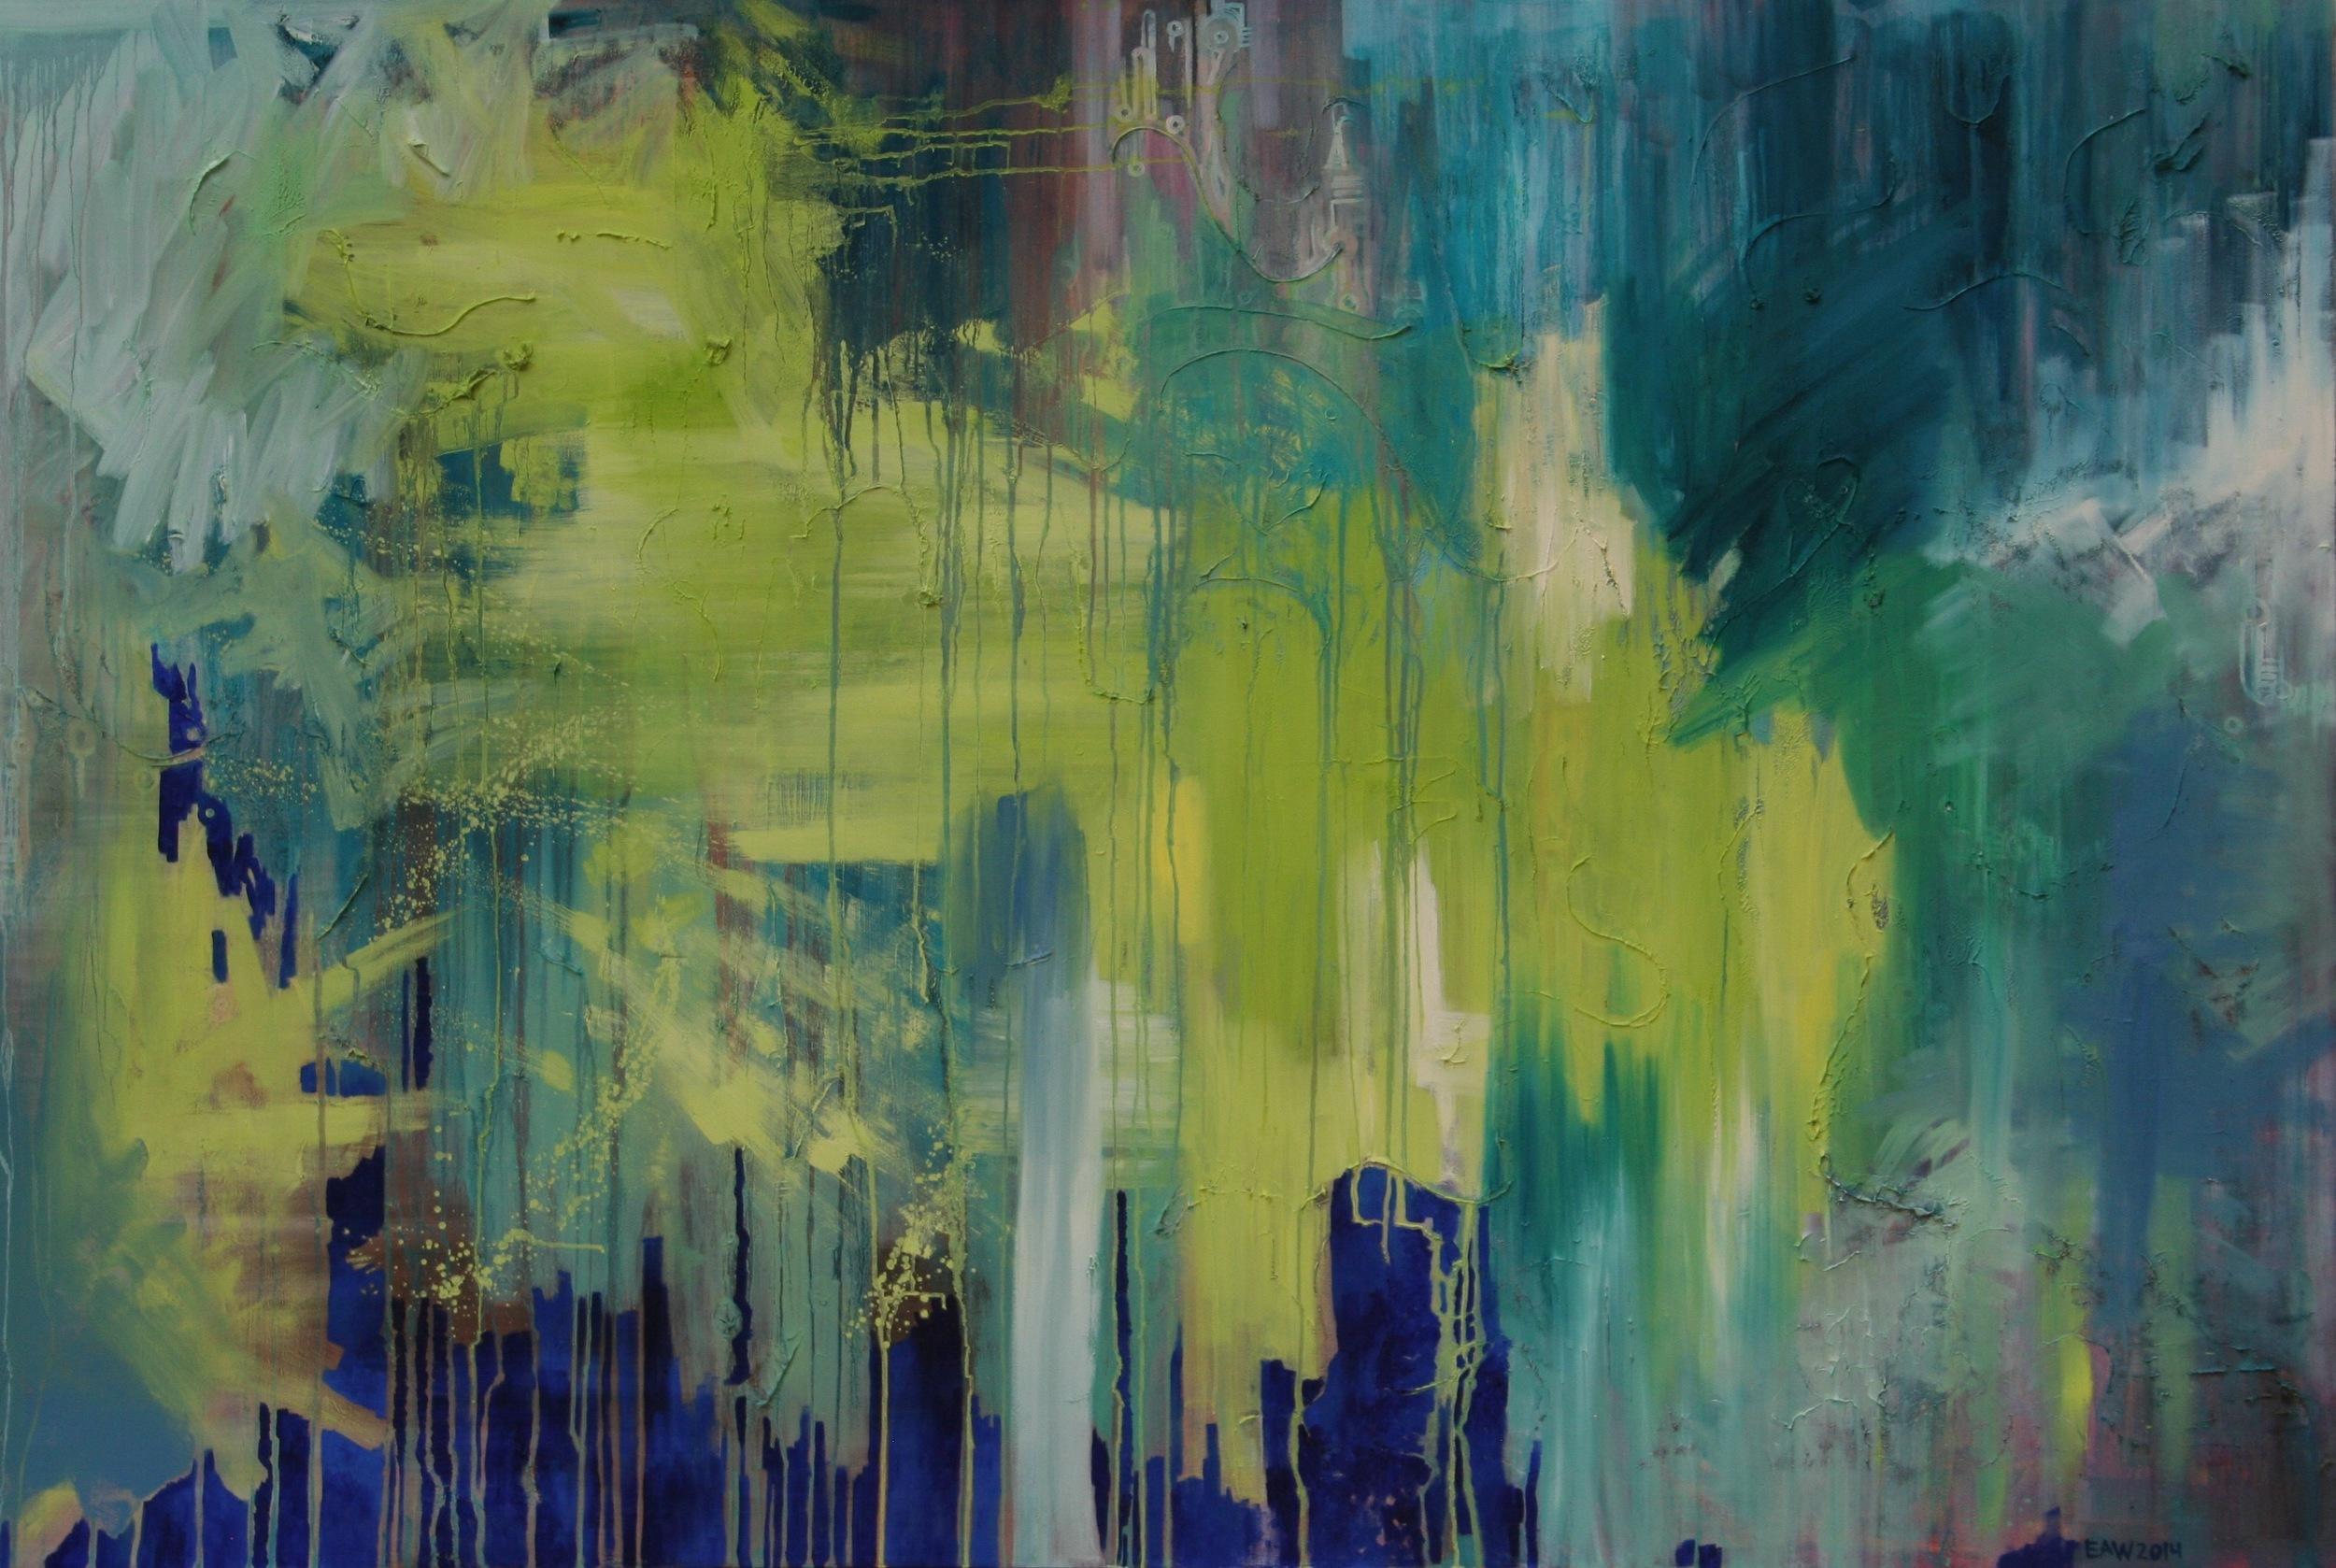 Unpredictable Hopes  4'x6' Oil on Canvas